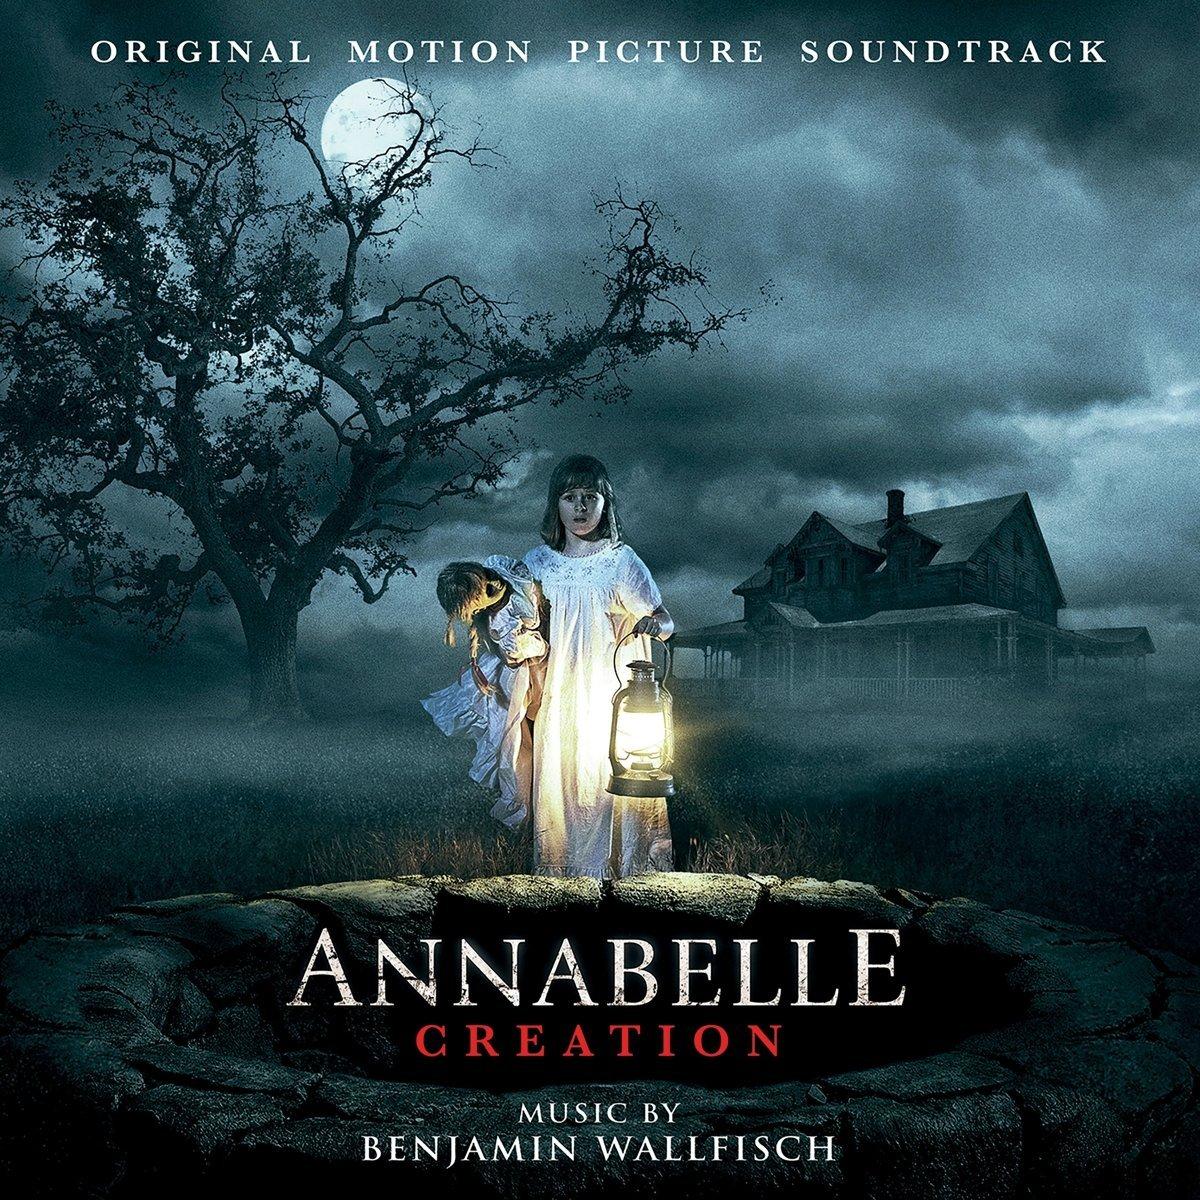 Annabelle: Creation, Detalles del álbum